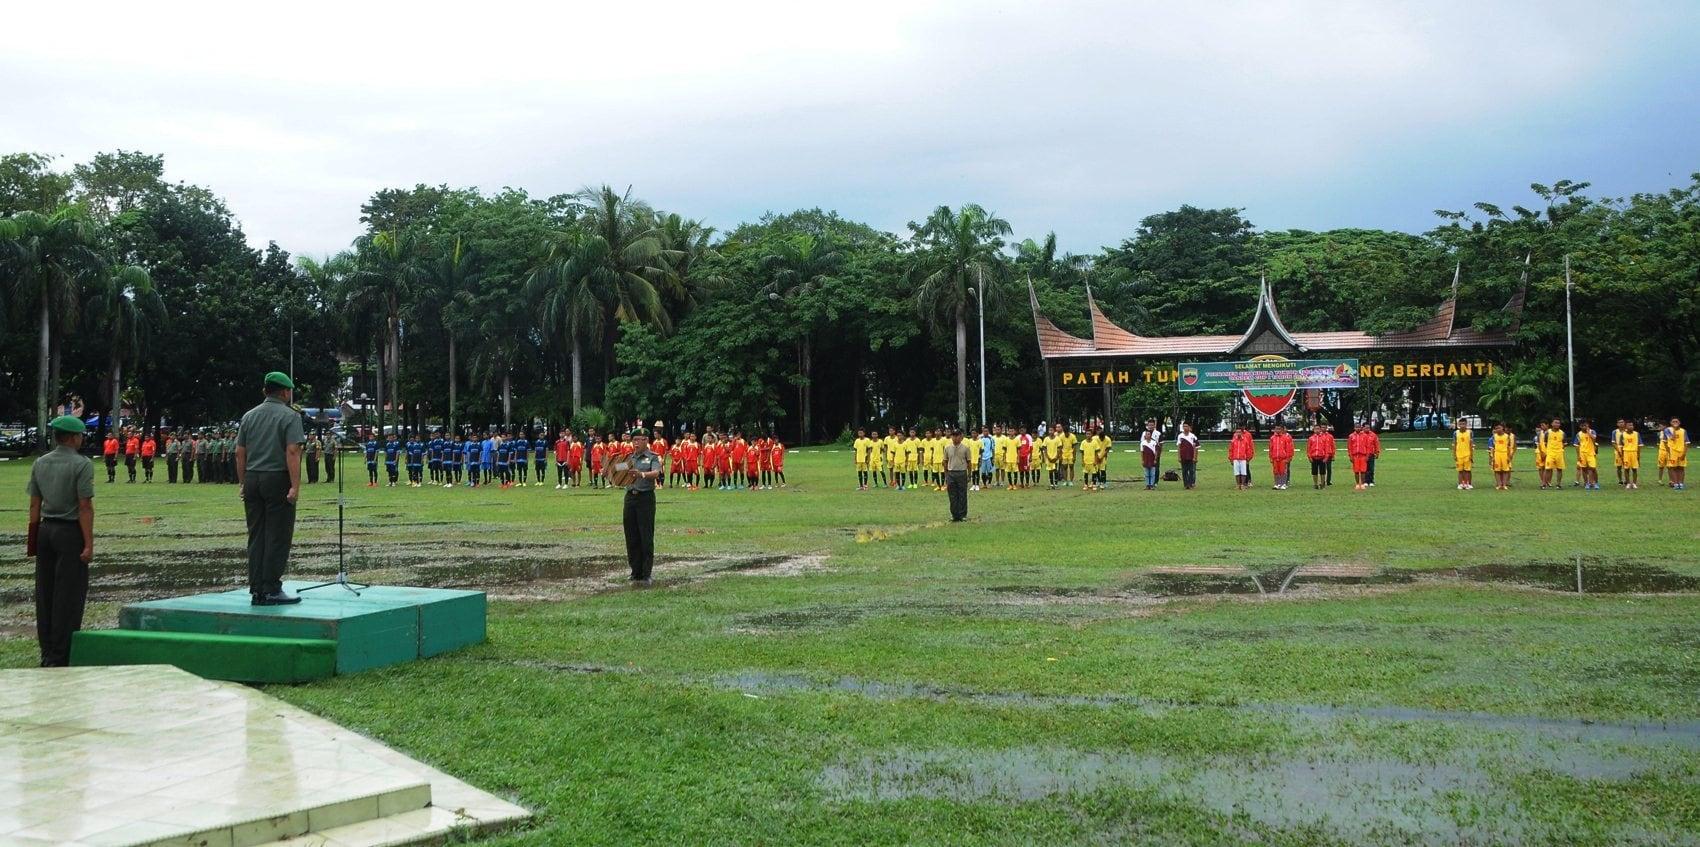 Tournamen Sepak Bola Yunior U 13-15 Danrem Cup se-Sumatera Barat Dibuka